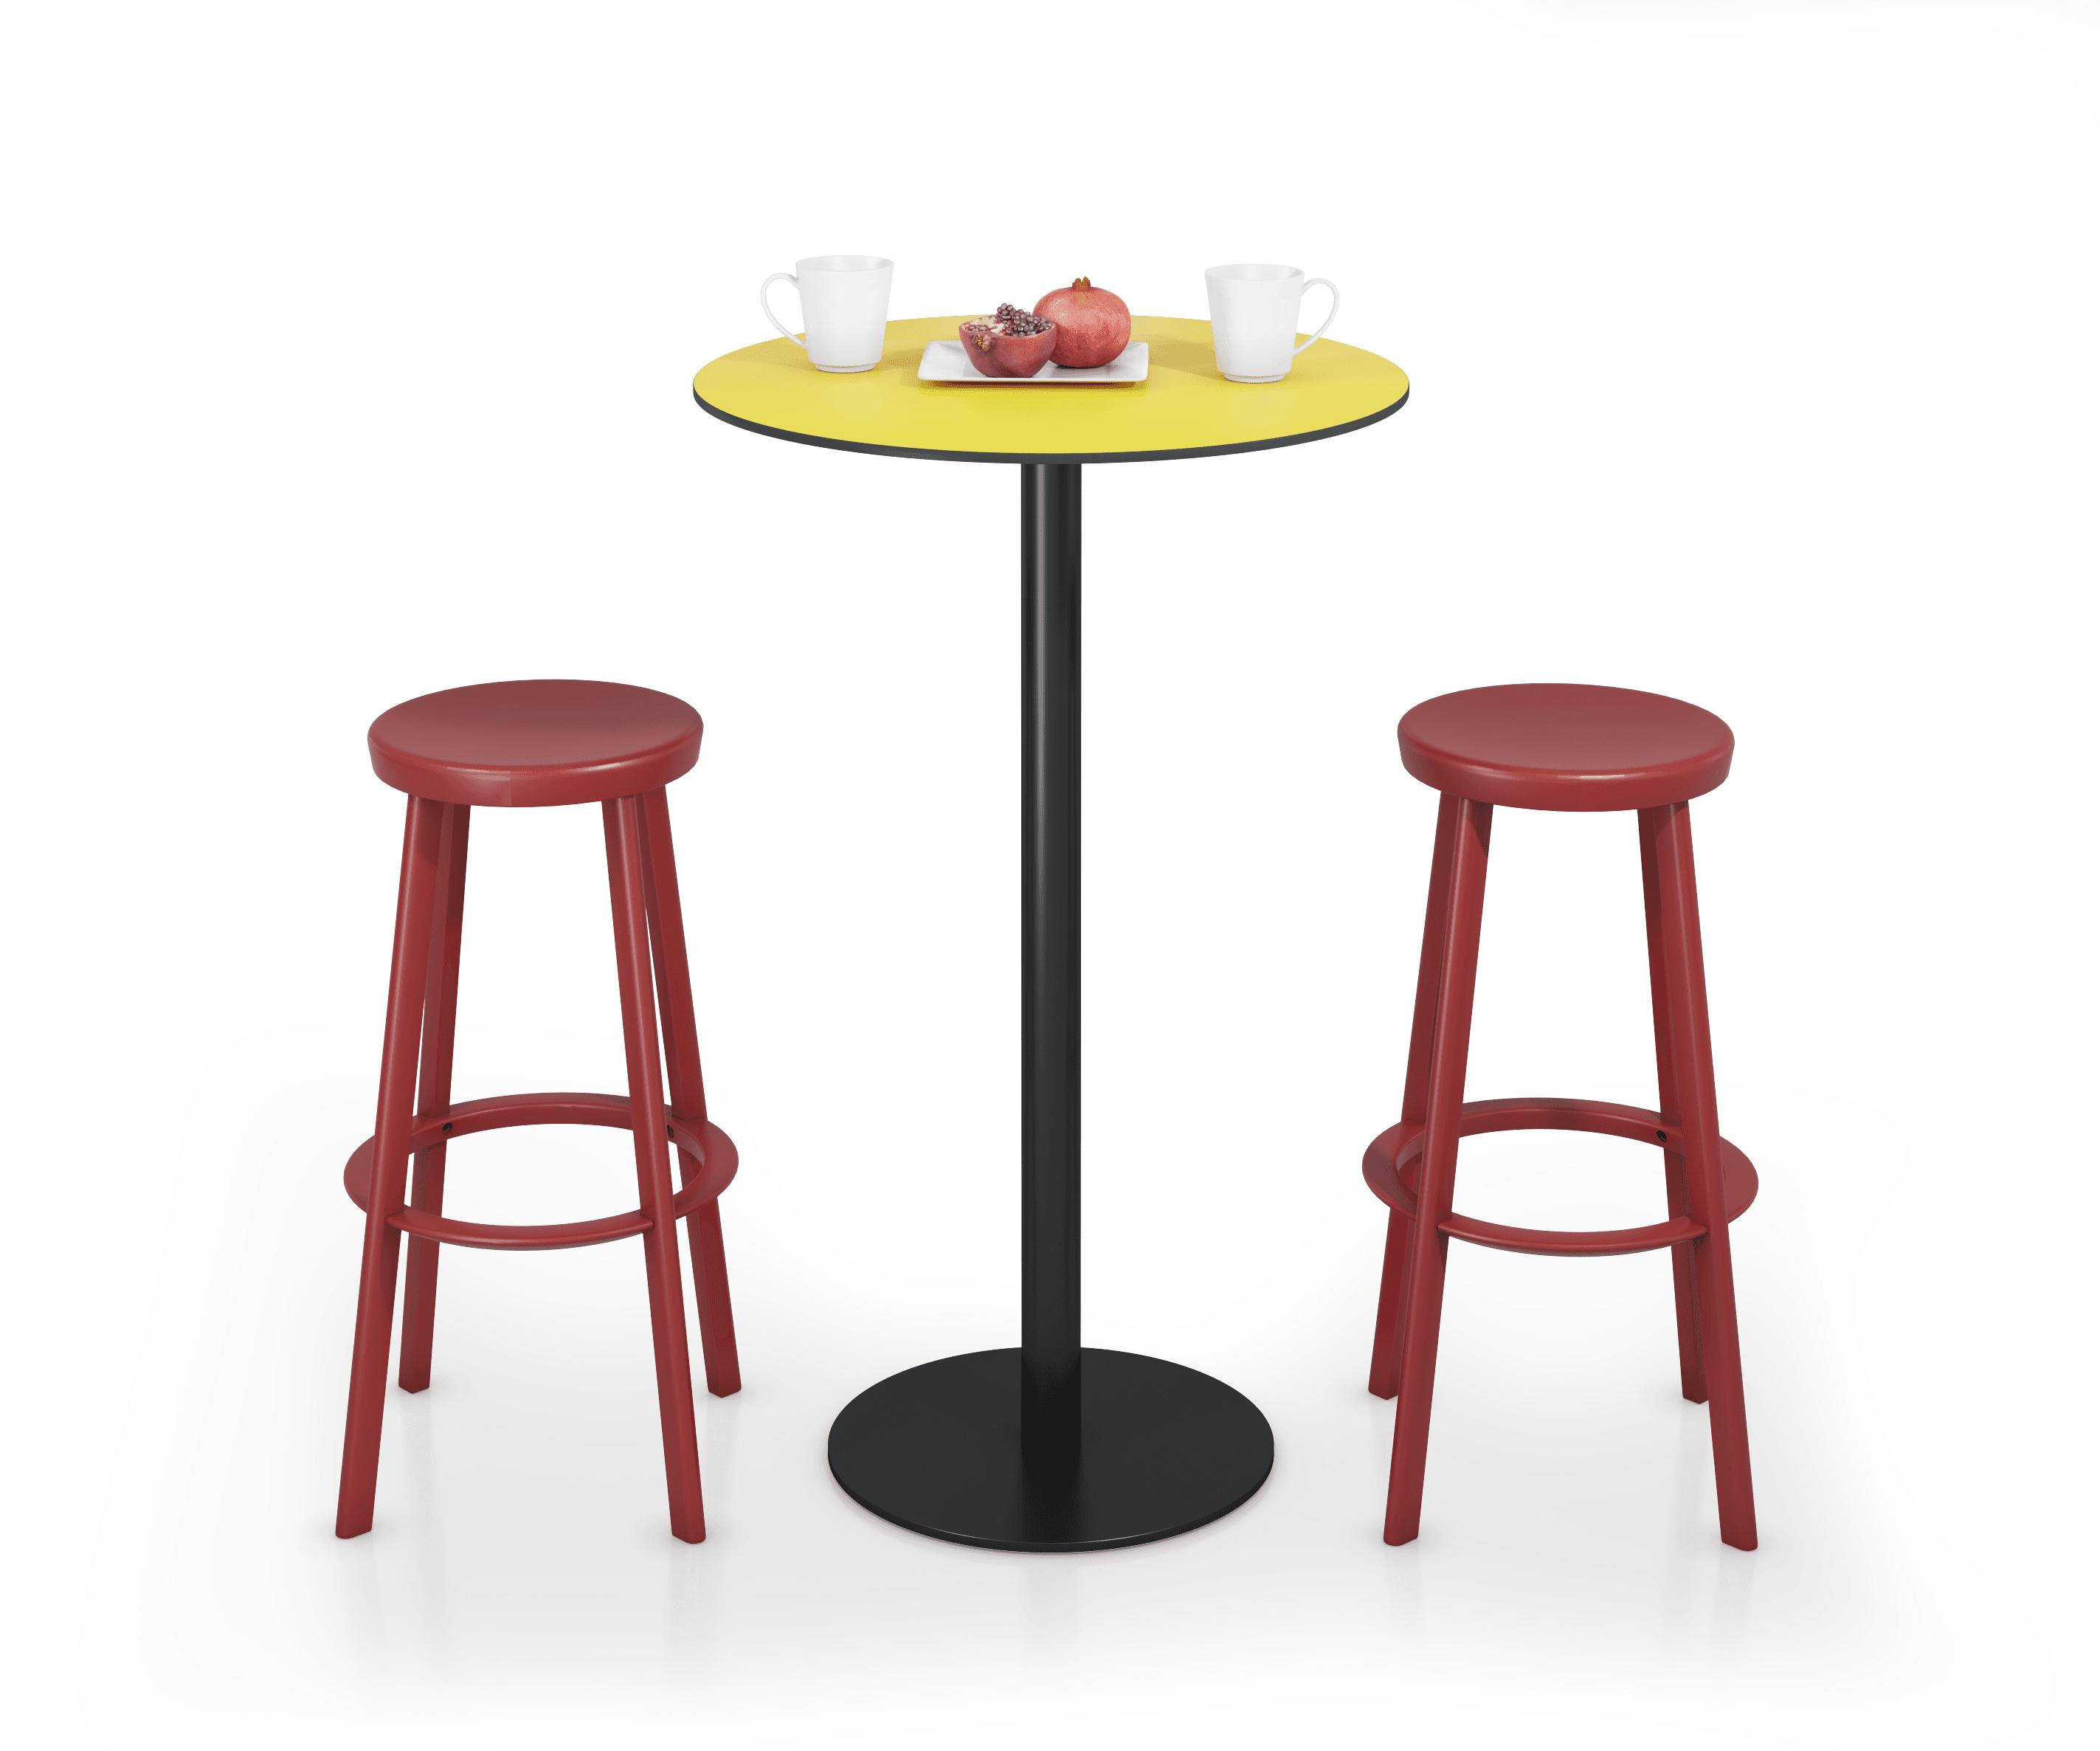 mesa-alta-amarilla-con-taburetes-rojos-compressor